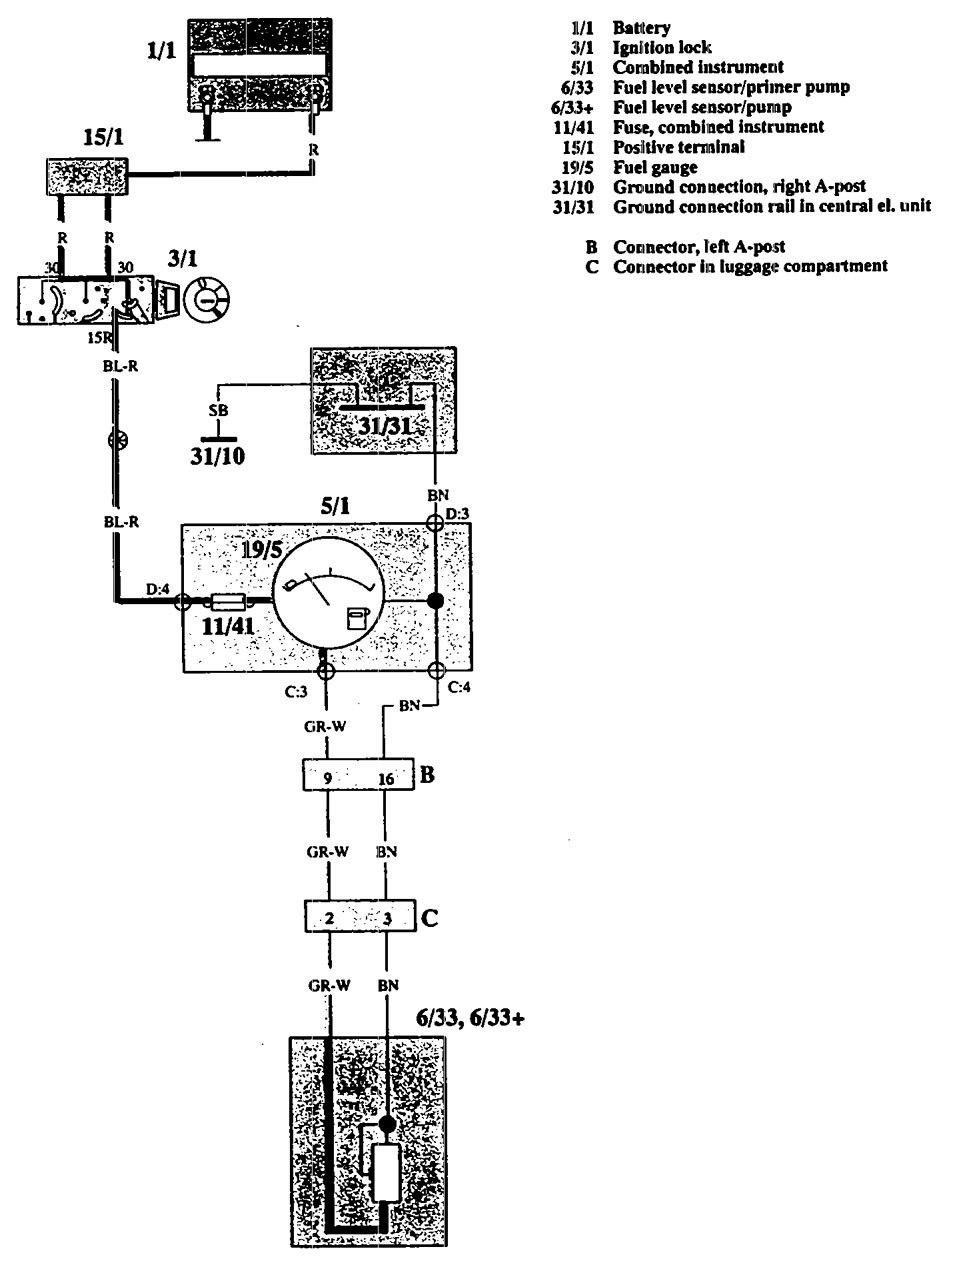 1992 volvo 940 wiring diagram  u2022 wiring diagram for free